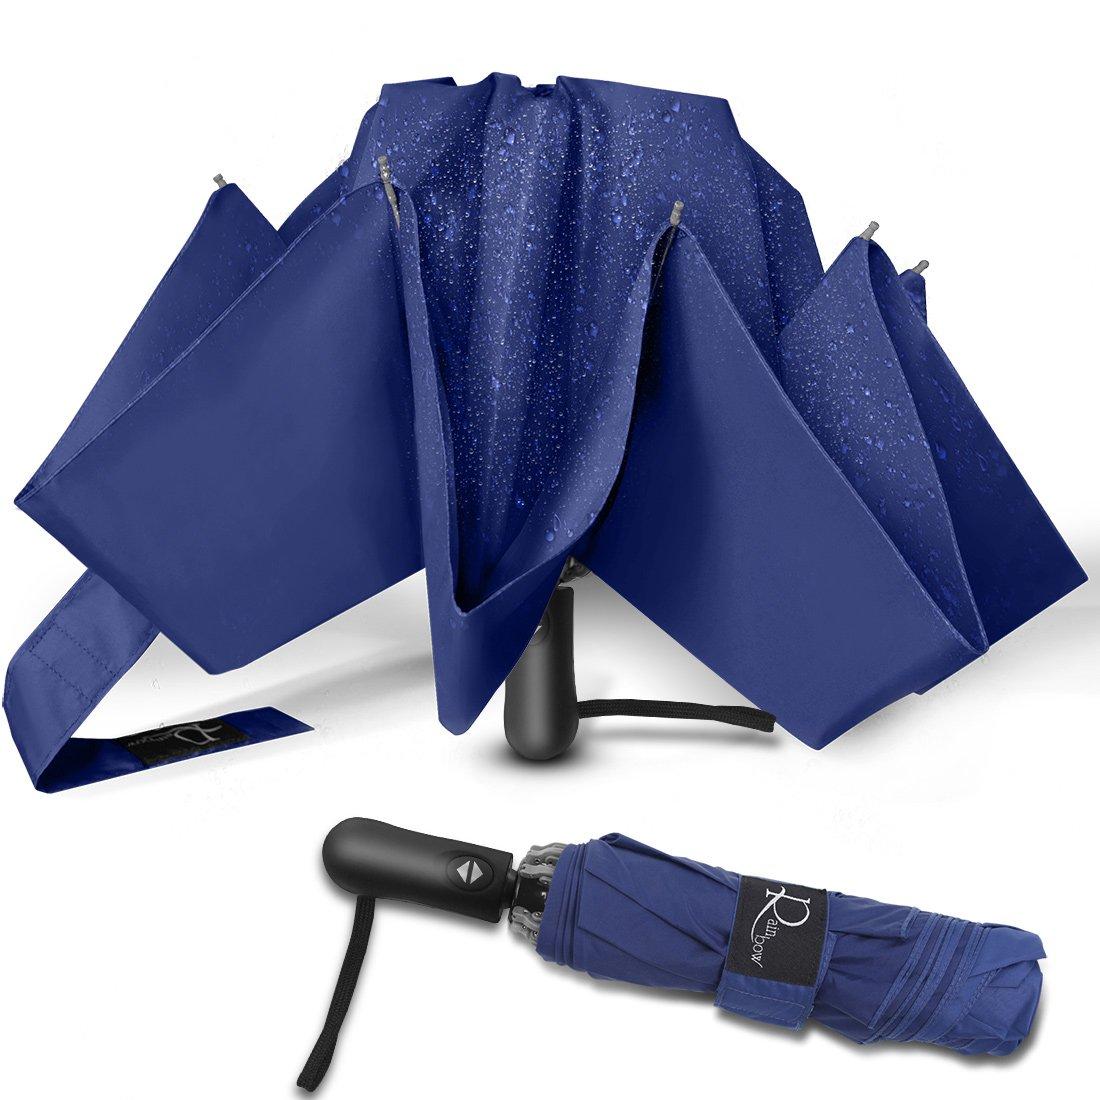 Nesus Umbrella Windproof Travel Umbrella 8 Ribs Auto Open Close with Waterproof Canopy Compact Folding Reverse Umbrella(Blue) by Nesus